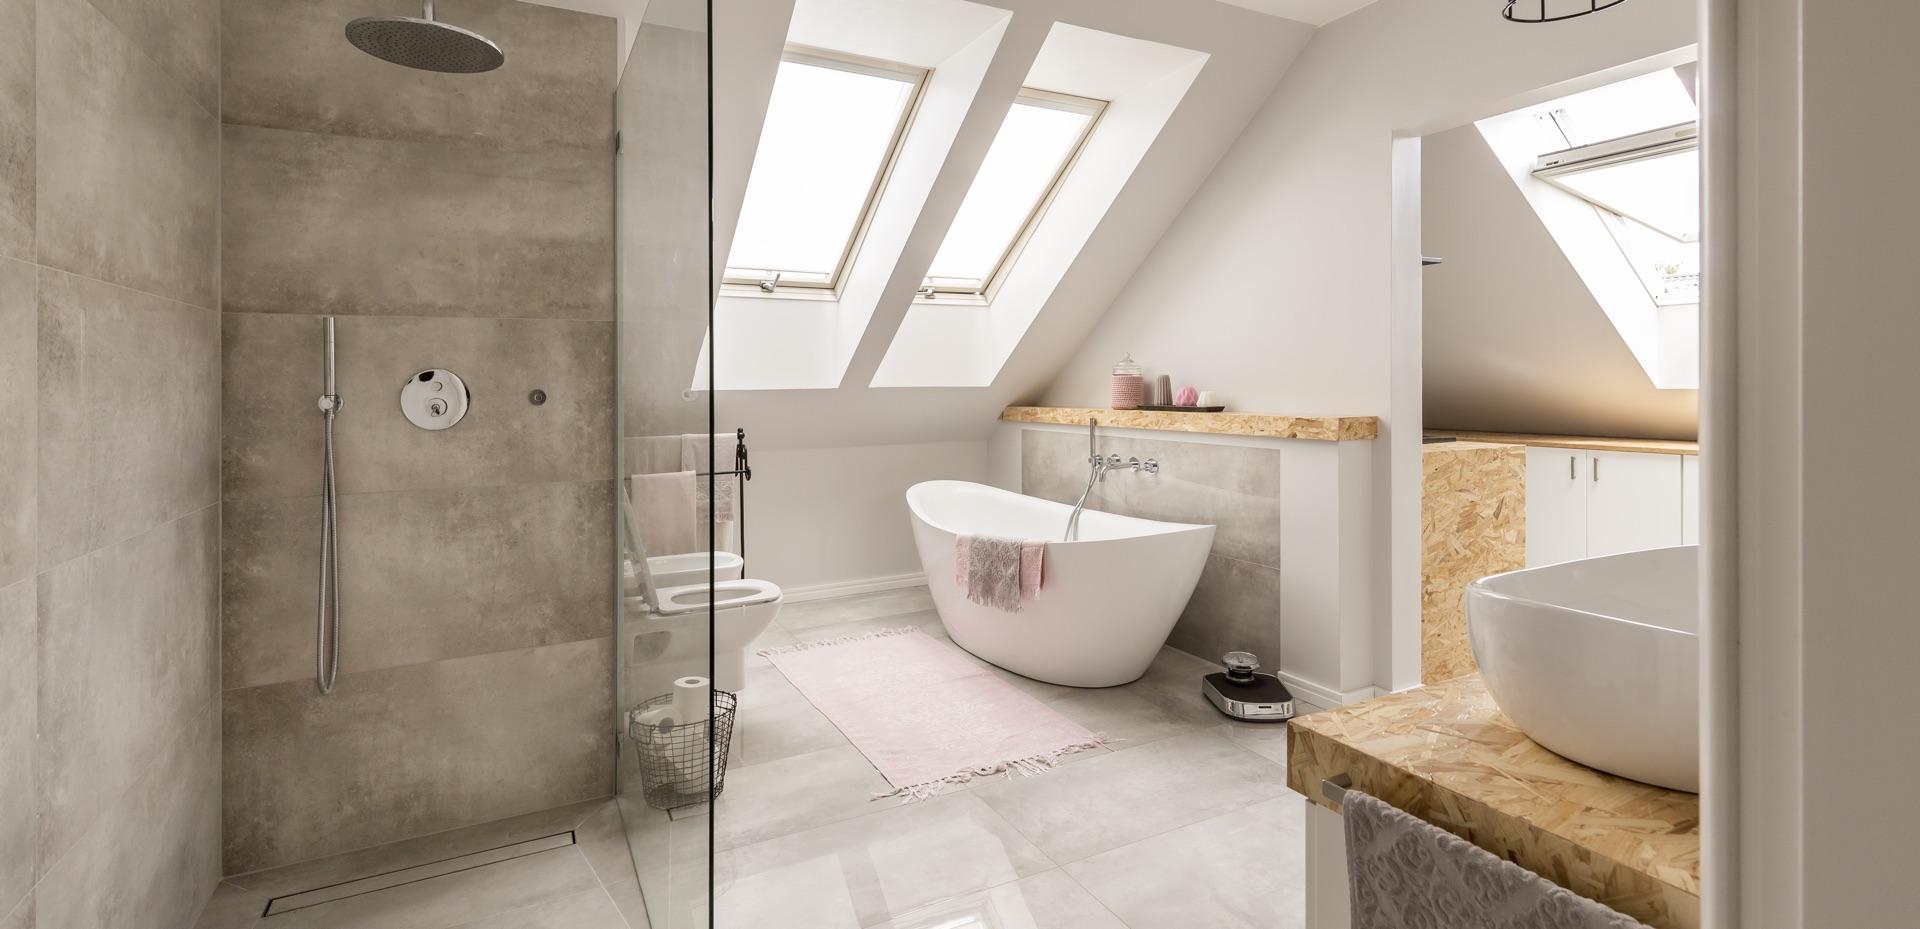 mijn-bad-in-stijl-moderne-badkamer-licht-bruin-wit-bad-douche